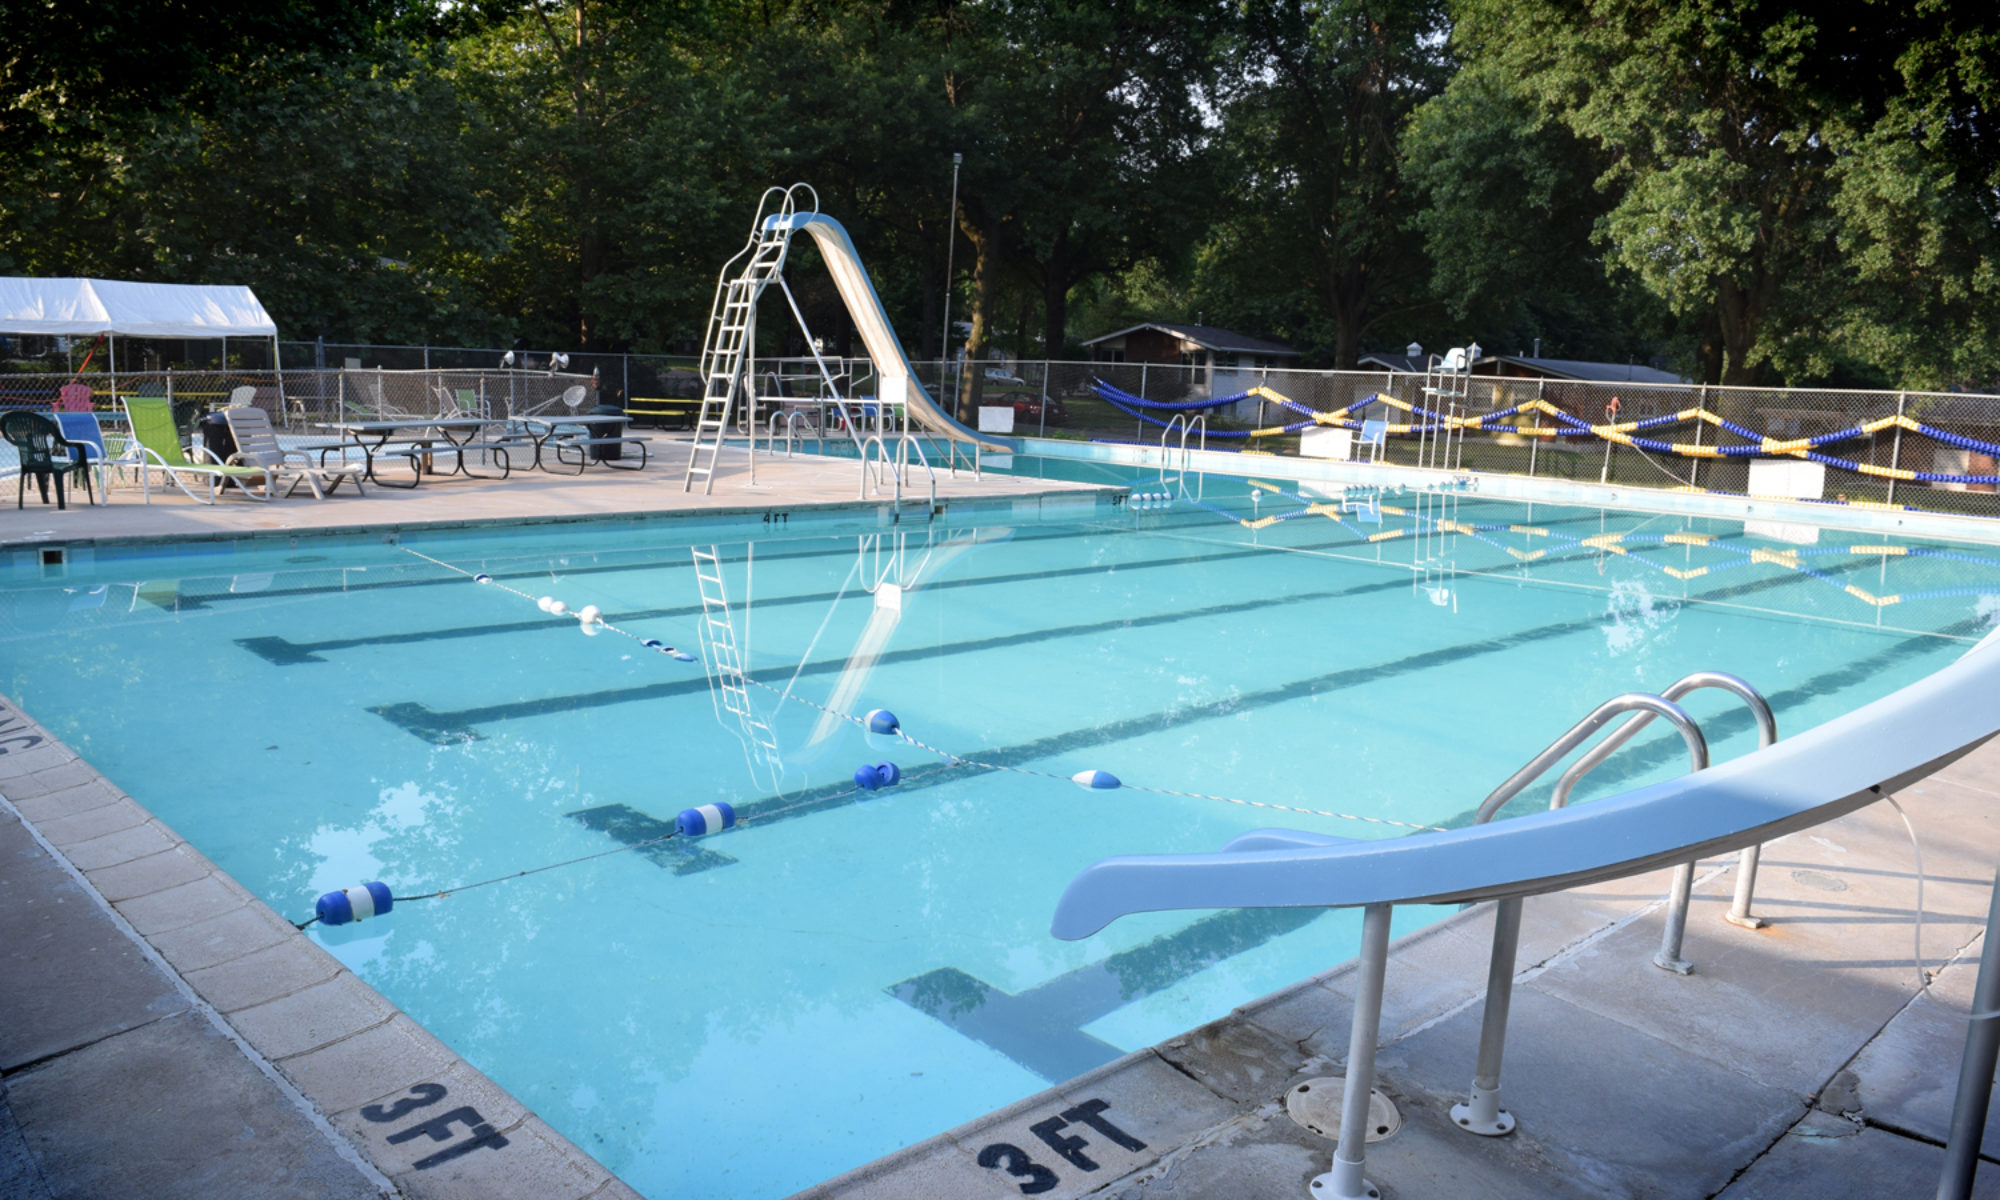 Meadow Lane Pool